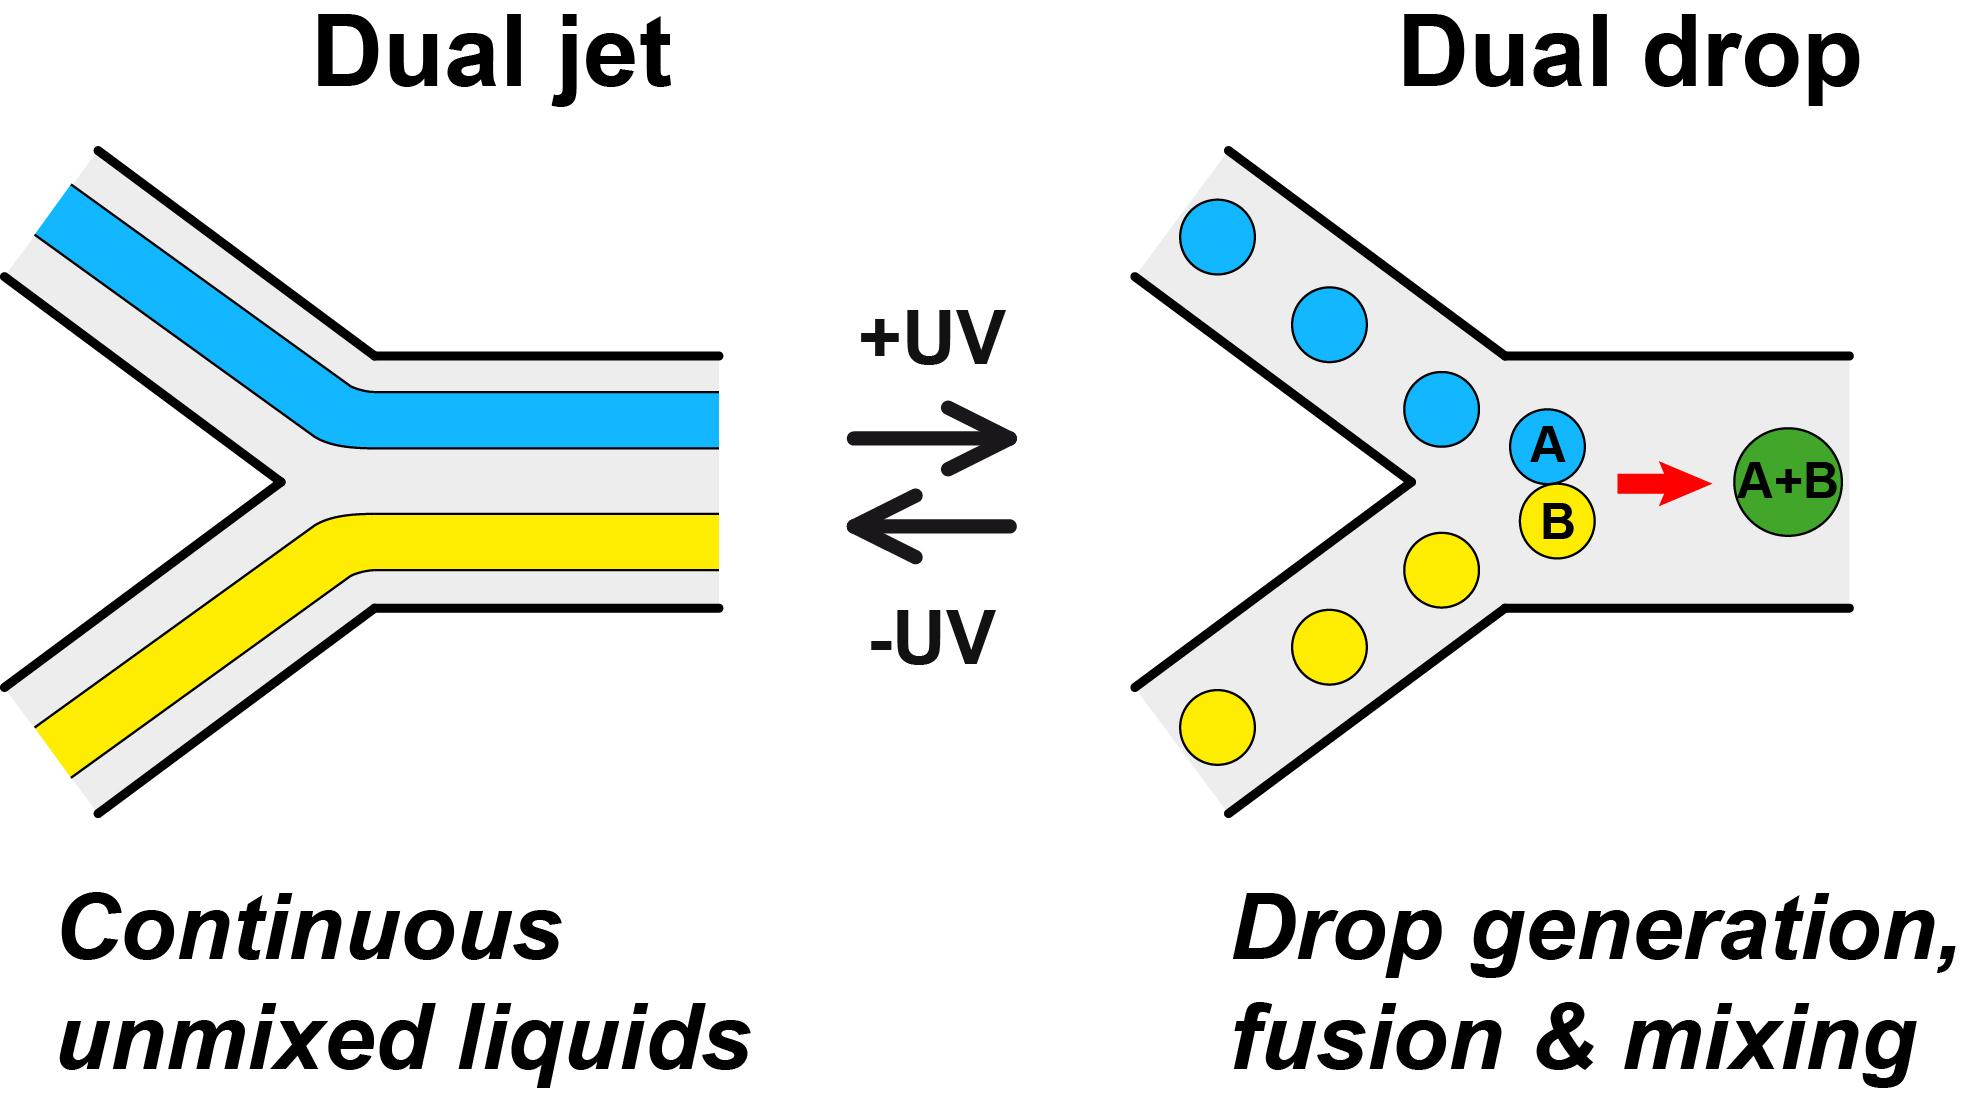 Optical drop generation, fusion and mixing!